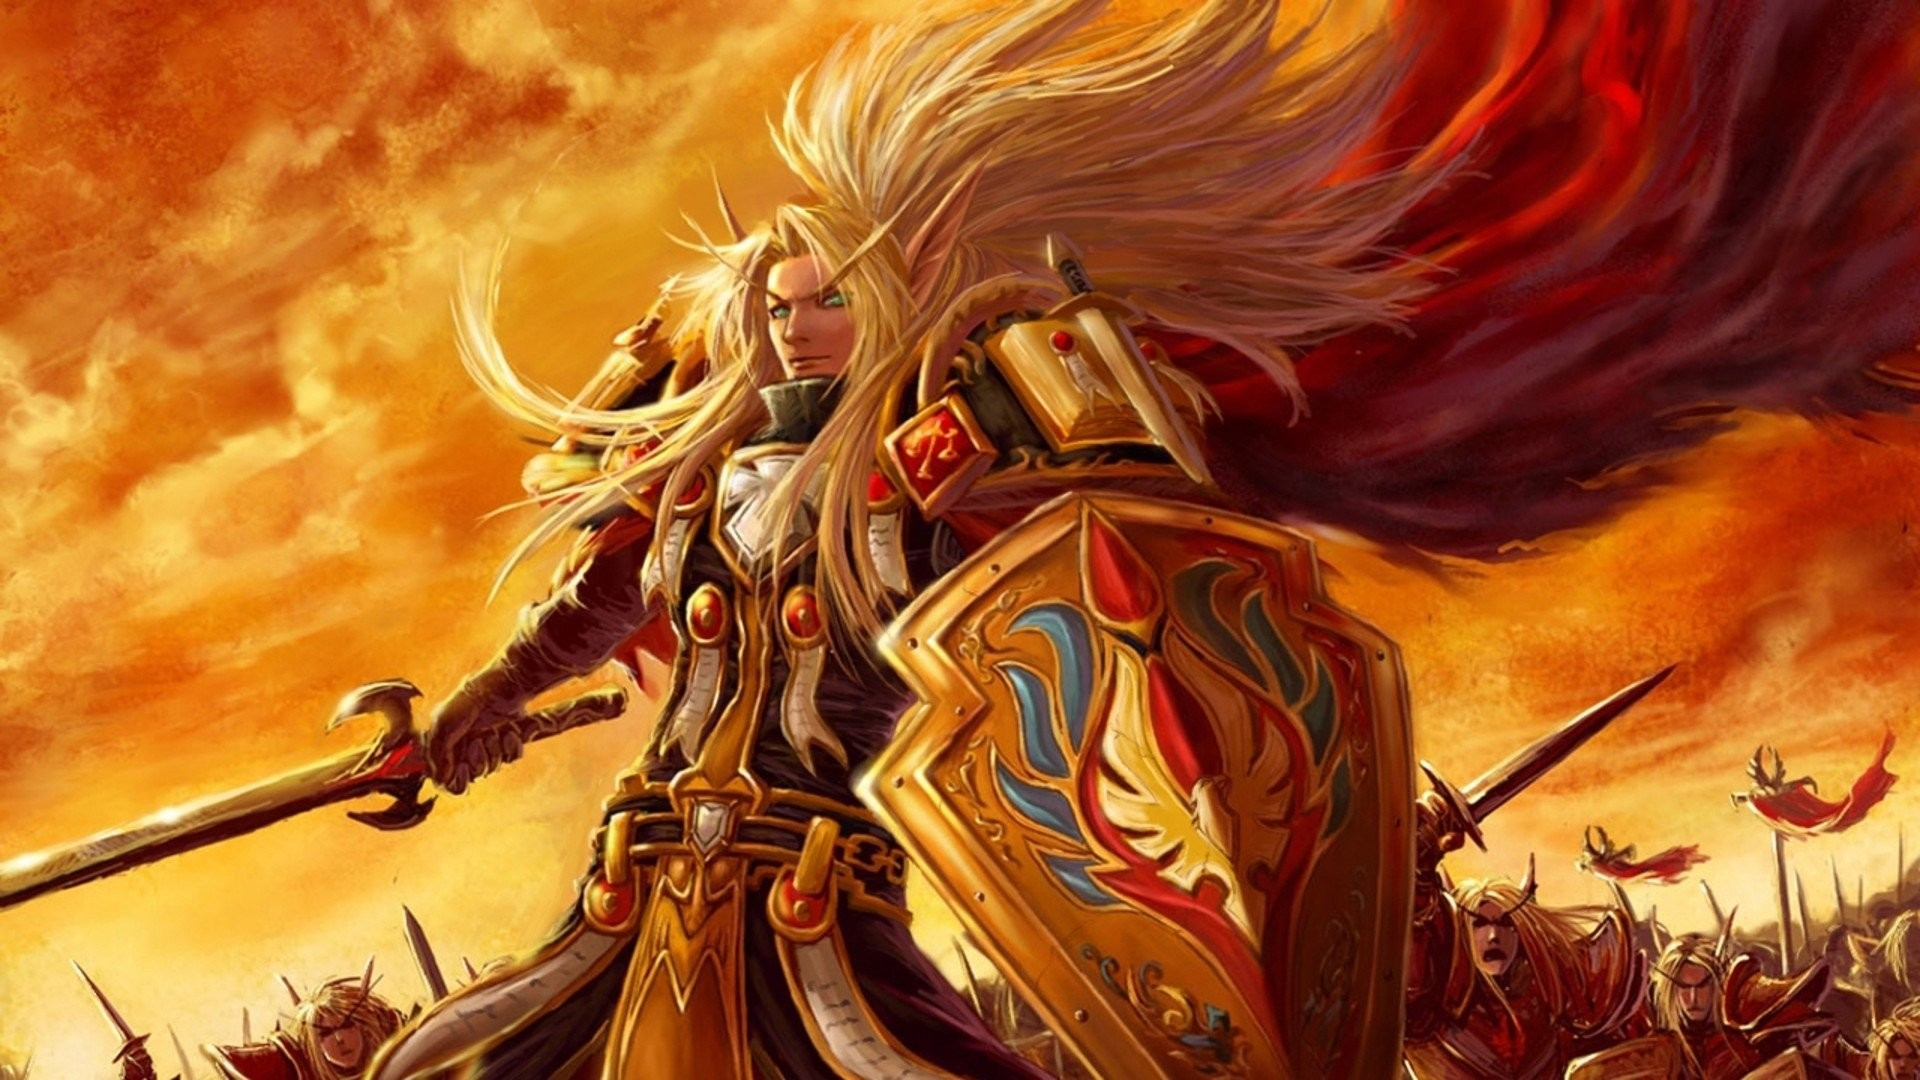 World Of Warcraft Wallpaper 1920x1080: World Of Warcraft Wallpaper HD Paladin (74+ Images